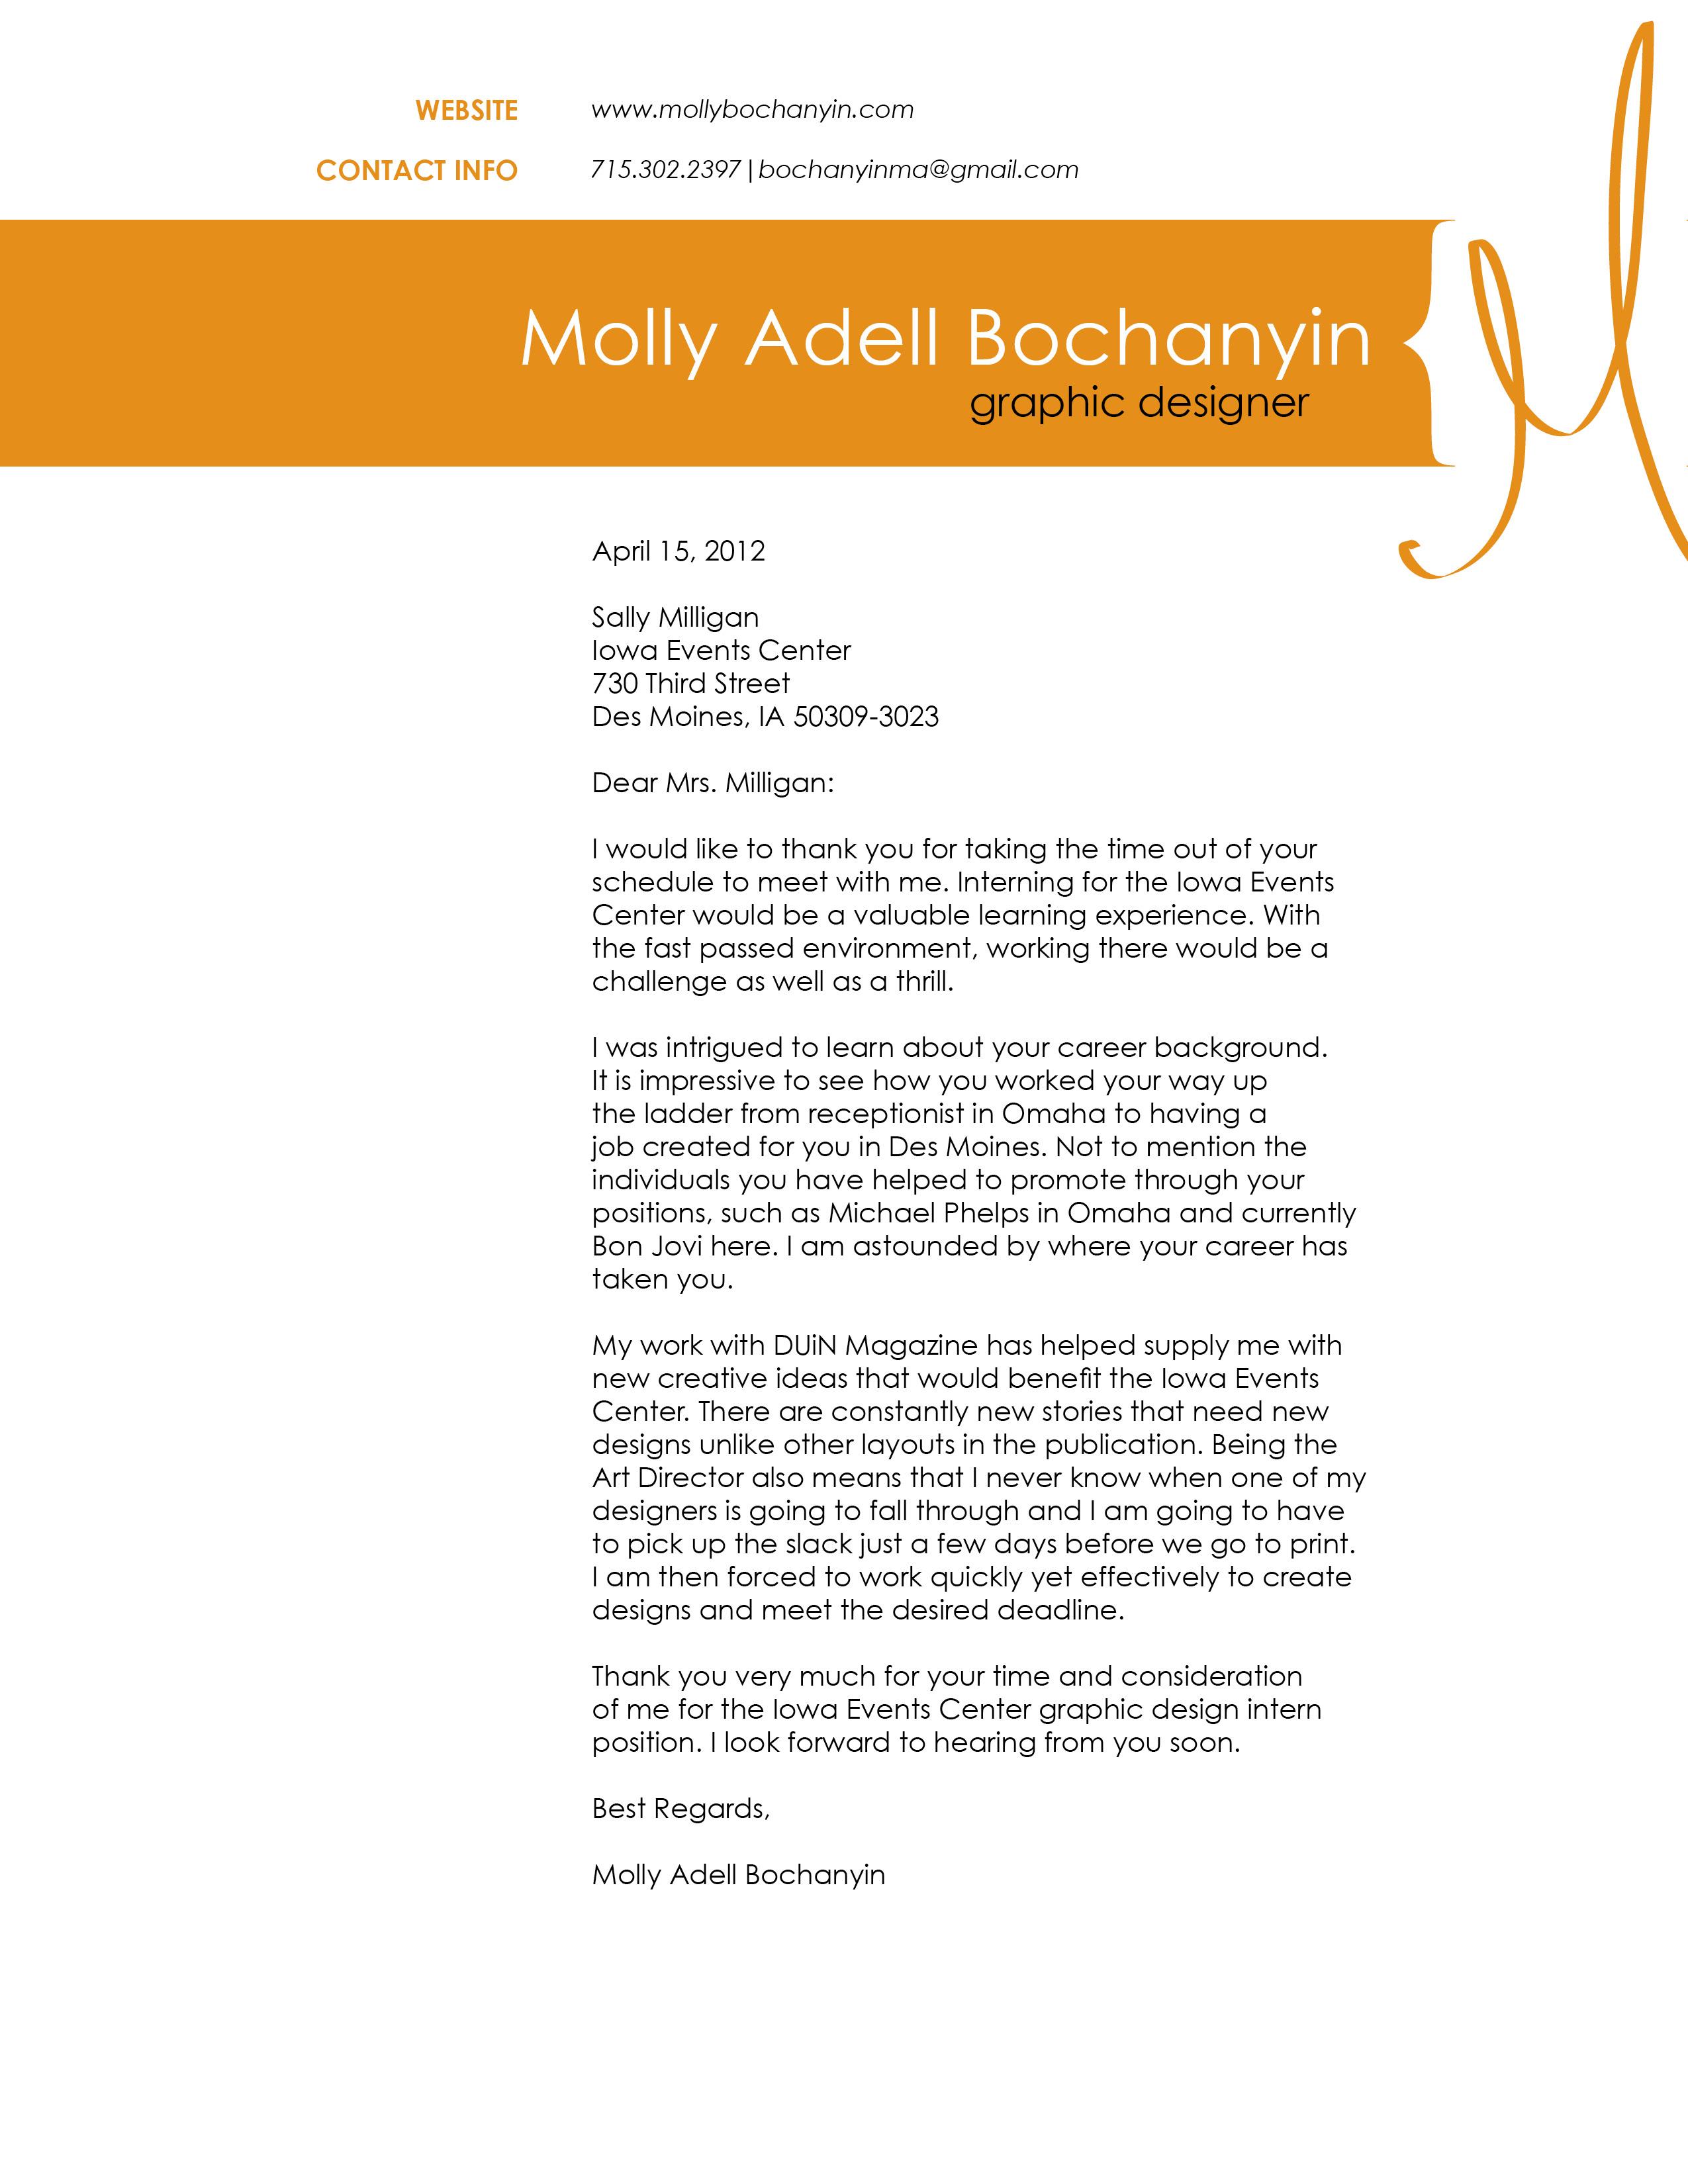 cover letter for graphic design internship